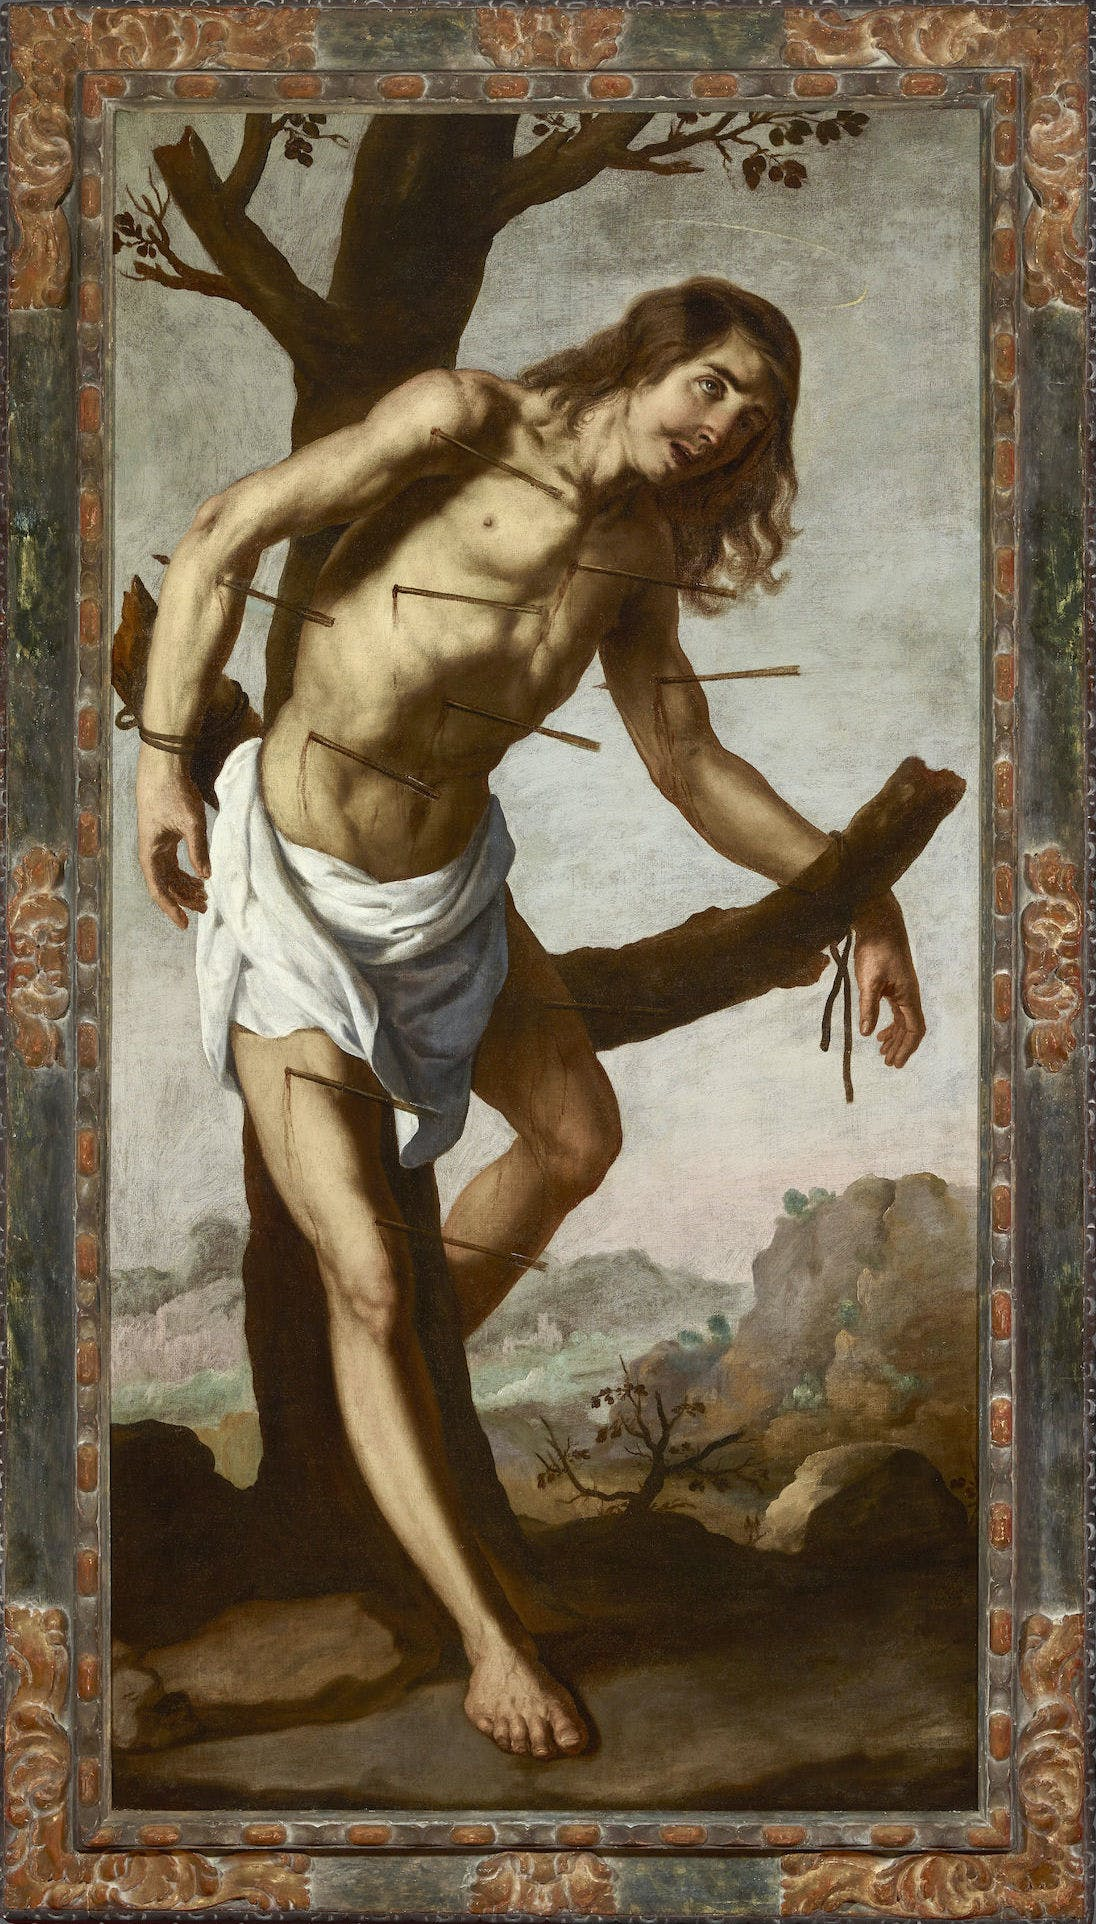 The Martyrdom of Saint Sebastian, Zurbarán